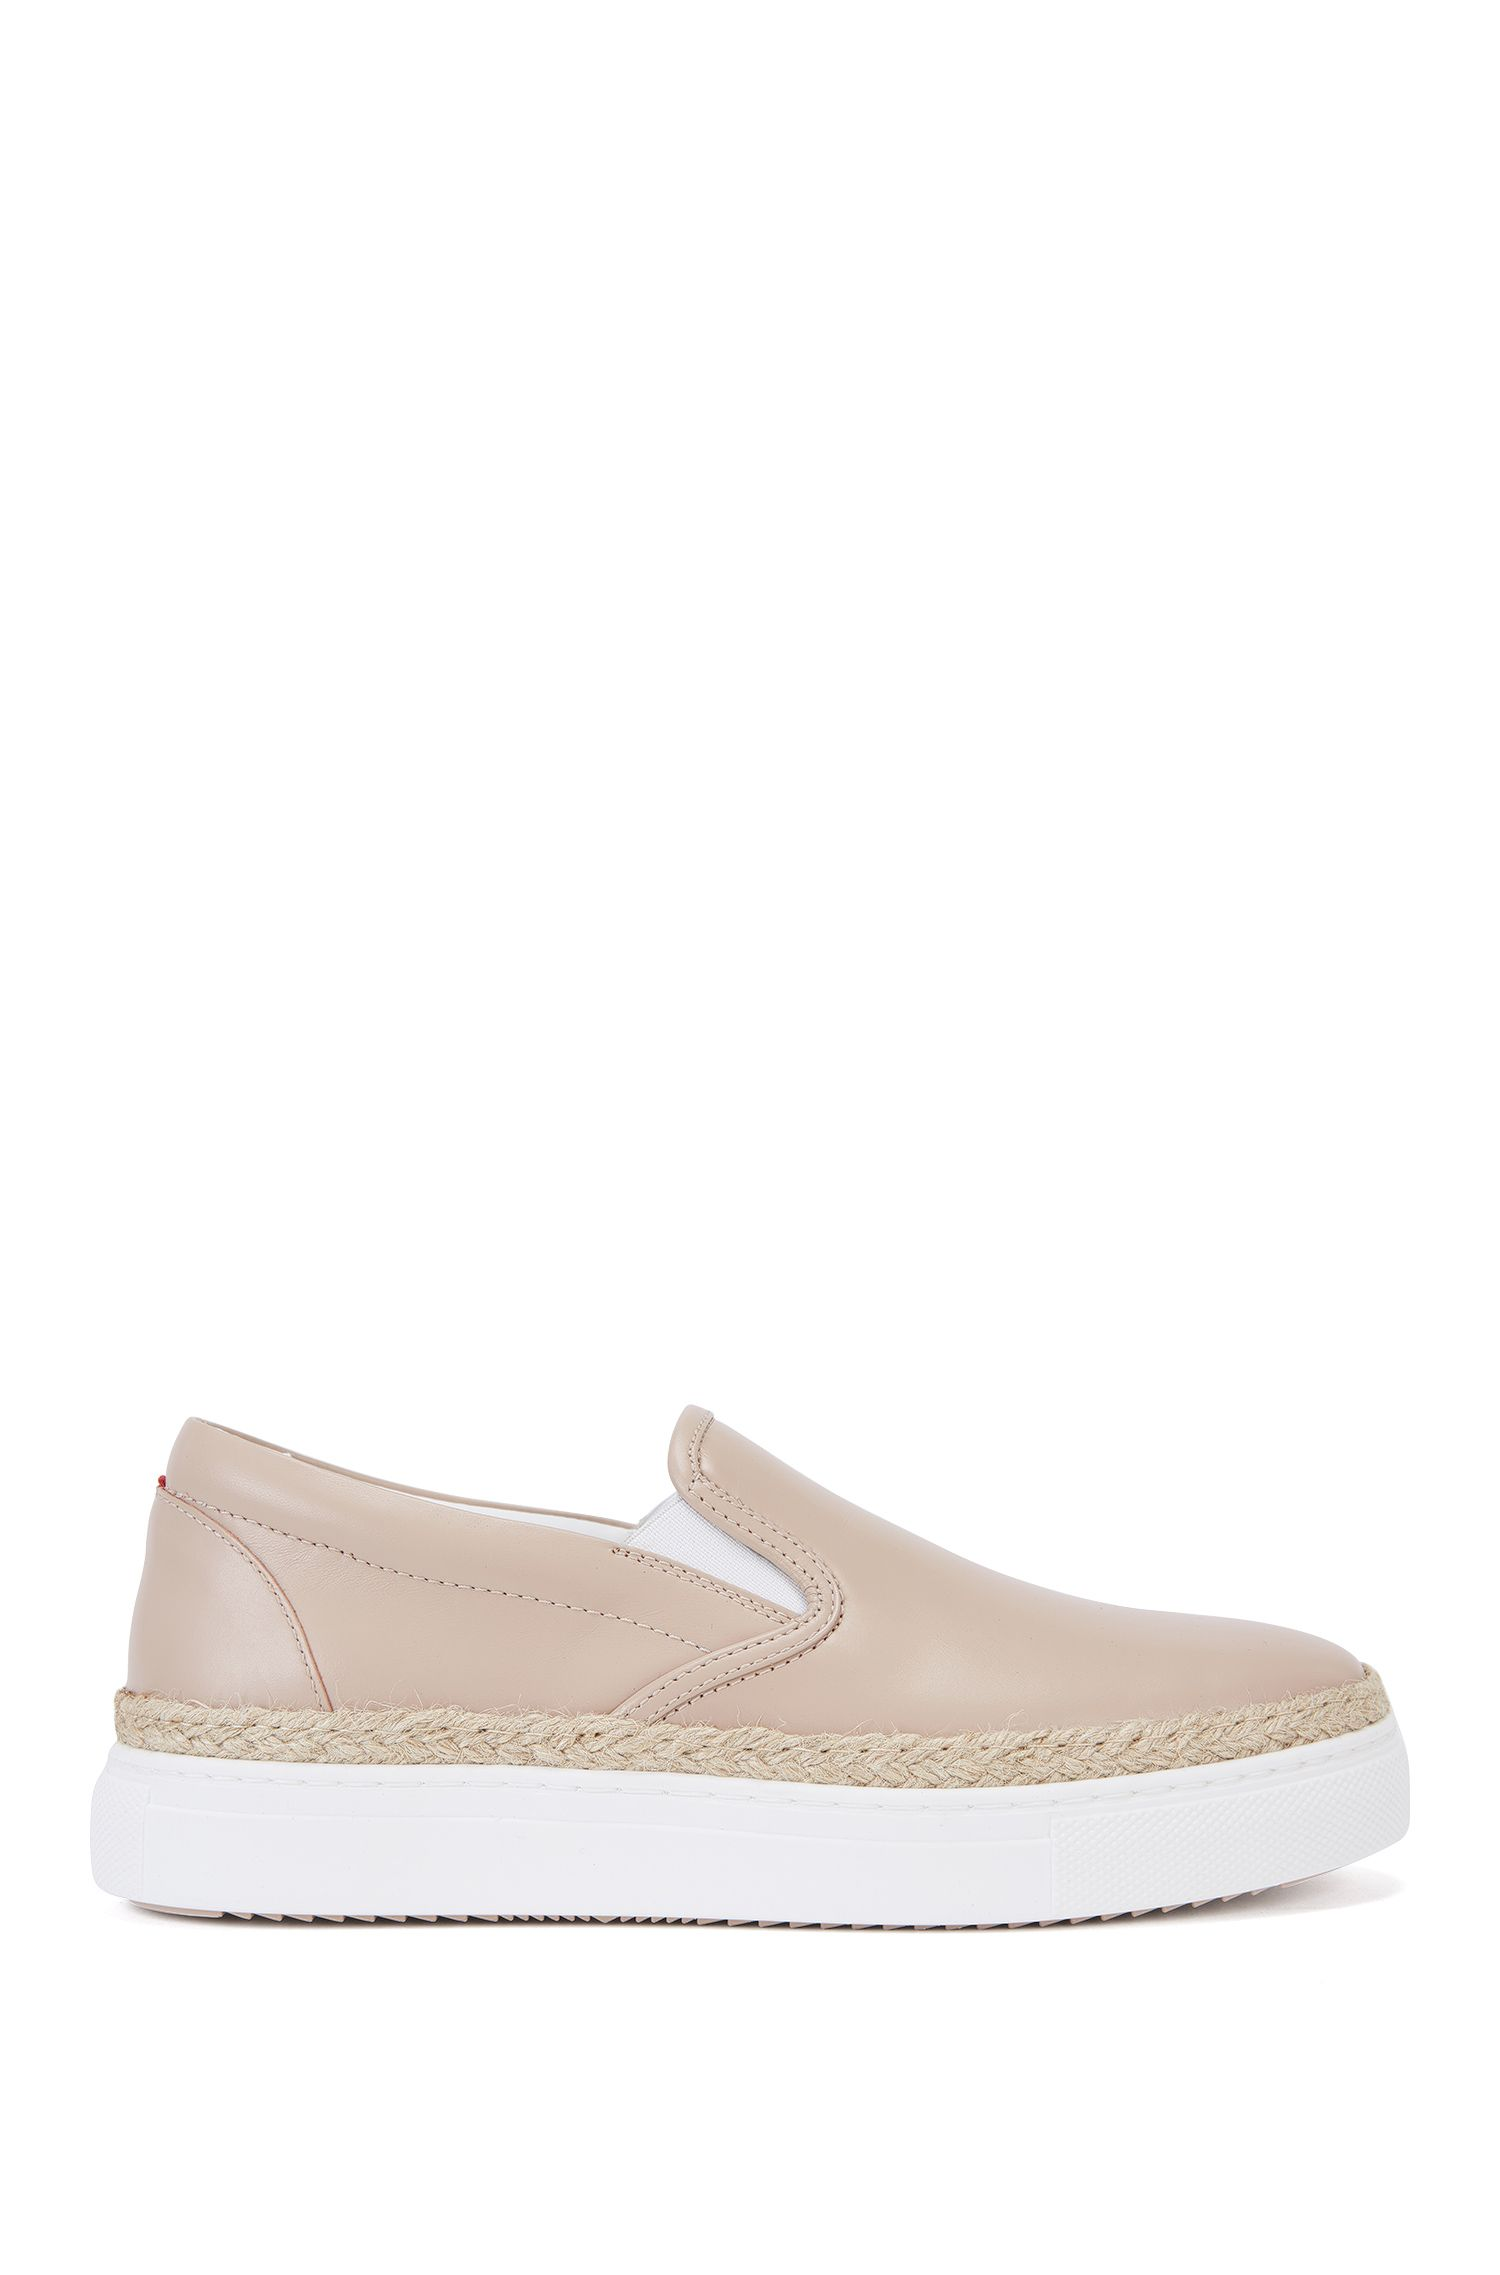 Sneakers senza stringhe in pelle con inserto in rafia: 'Chloe-R'